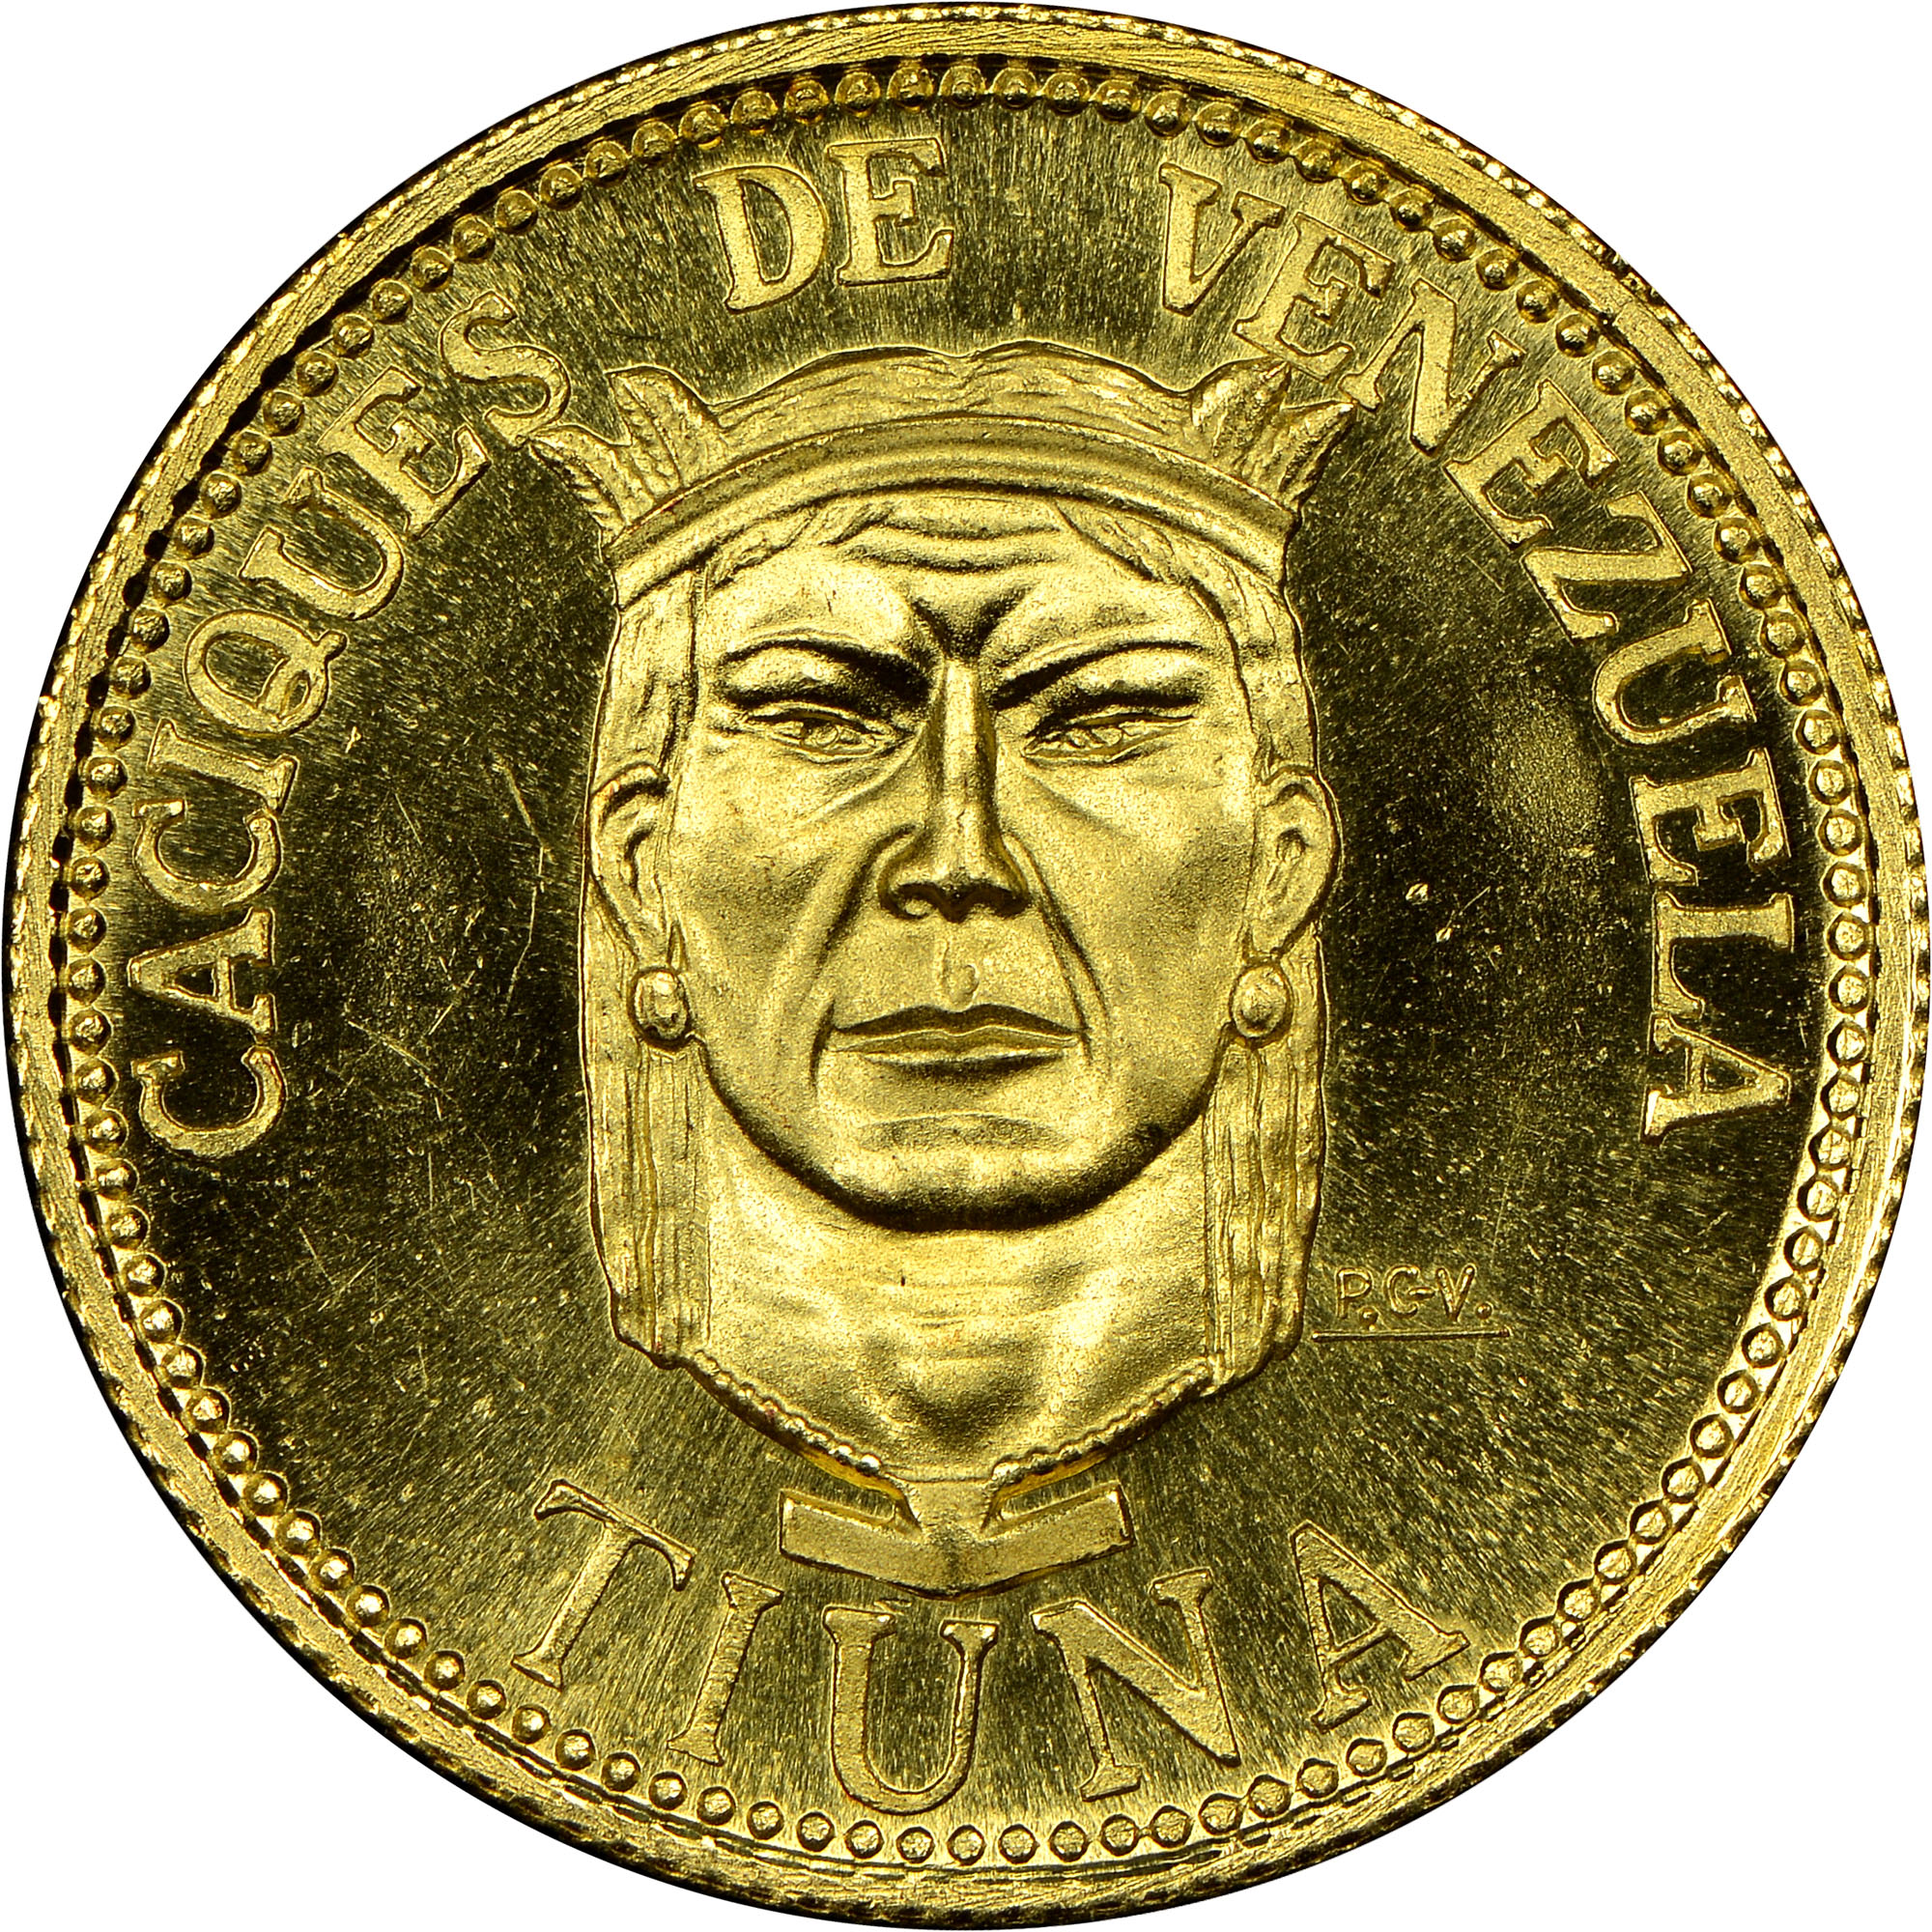 Venezuela 20 Bolivares X Mb86 Prices Amp Values Ngc